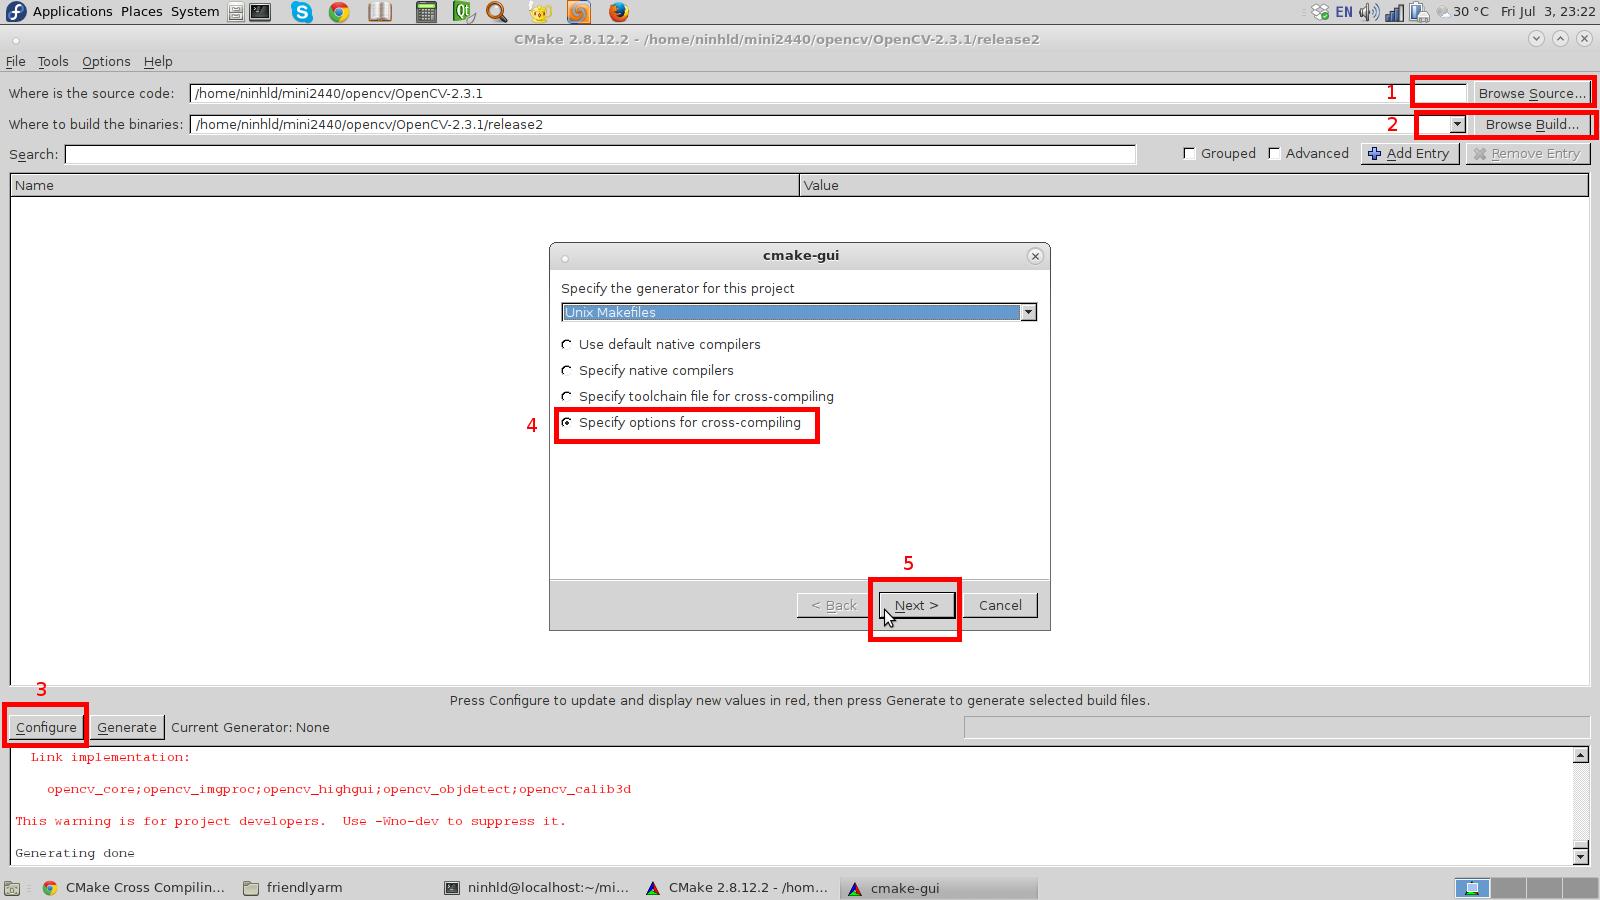 Build OpenCV cho board nhúng FriendlyARM Mini2440